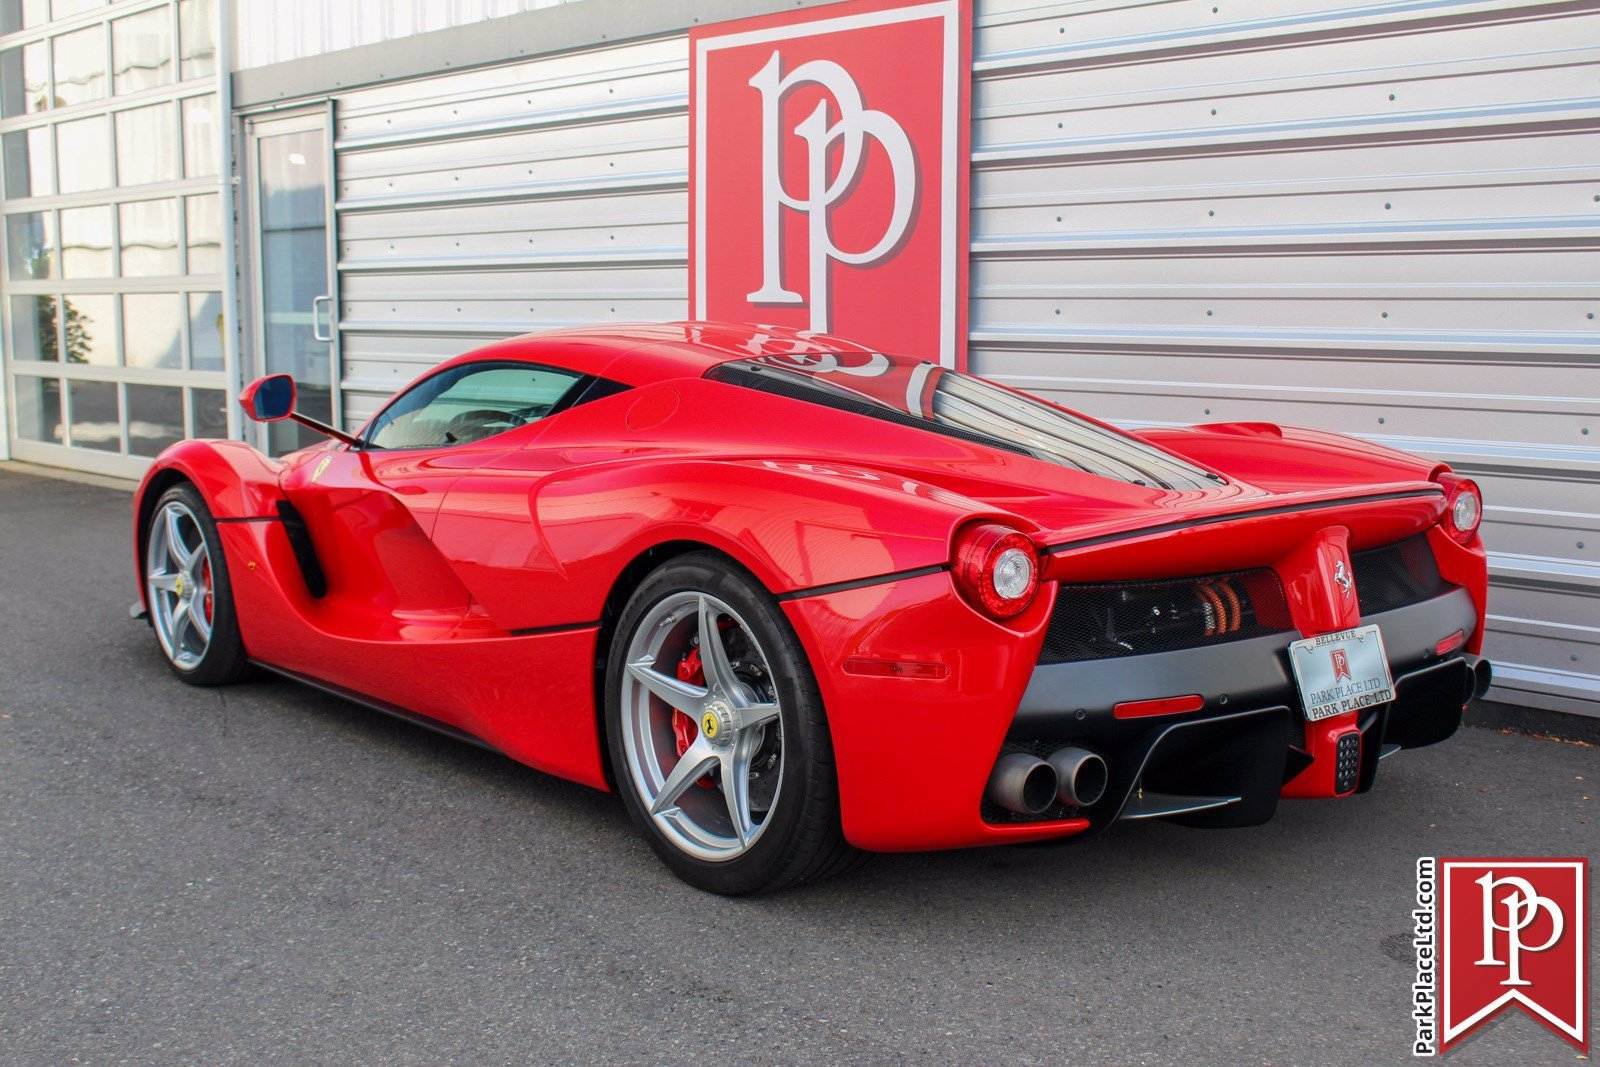 2014_Ferrari_LaFerrari_sale-0002